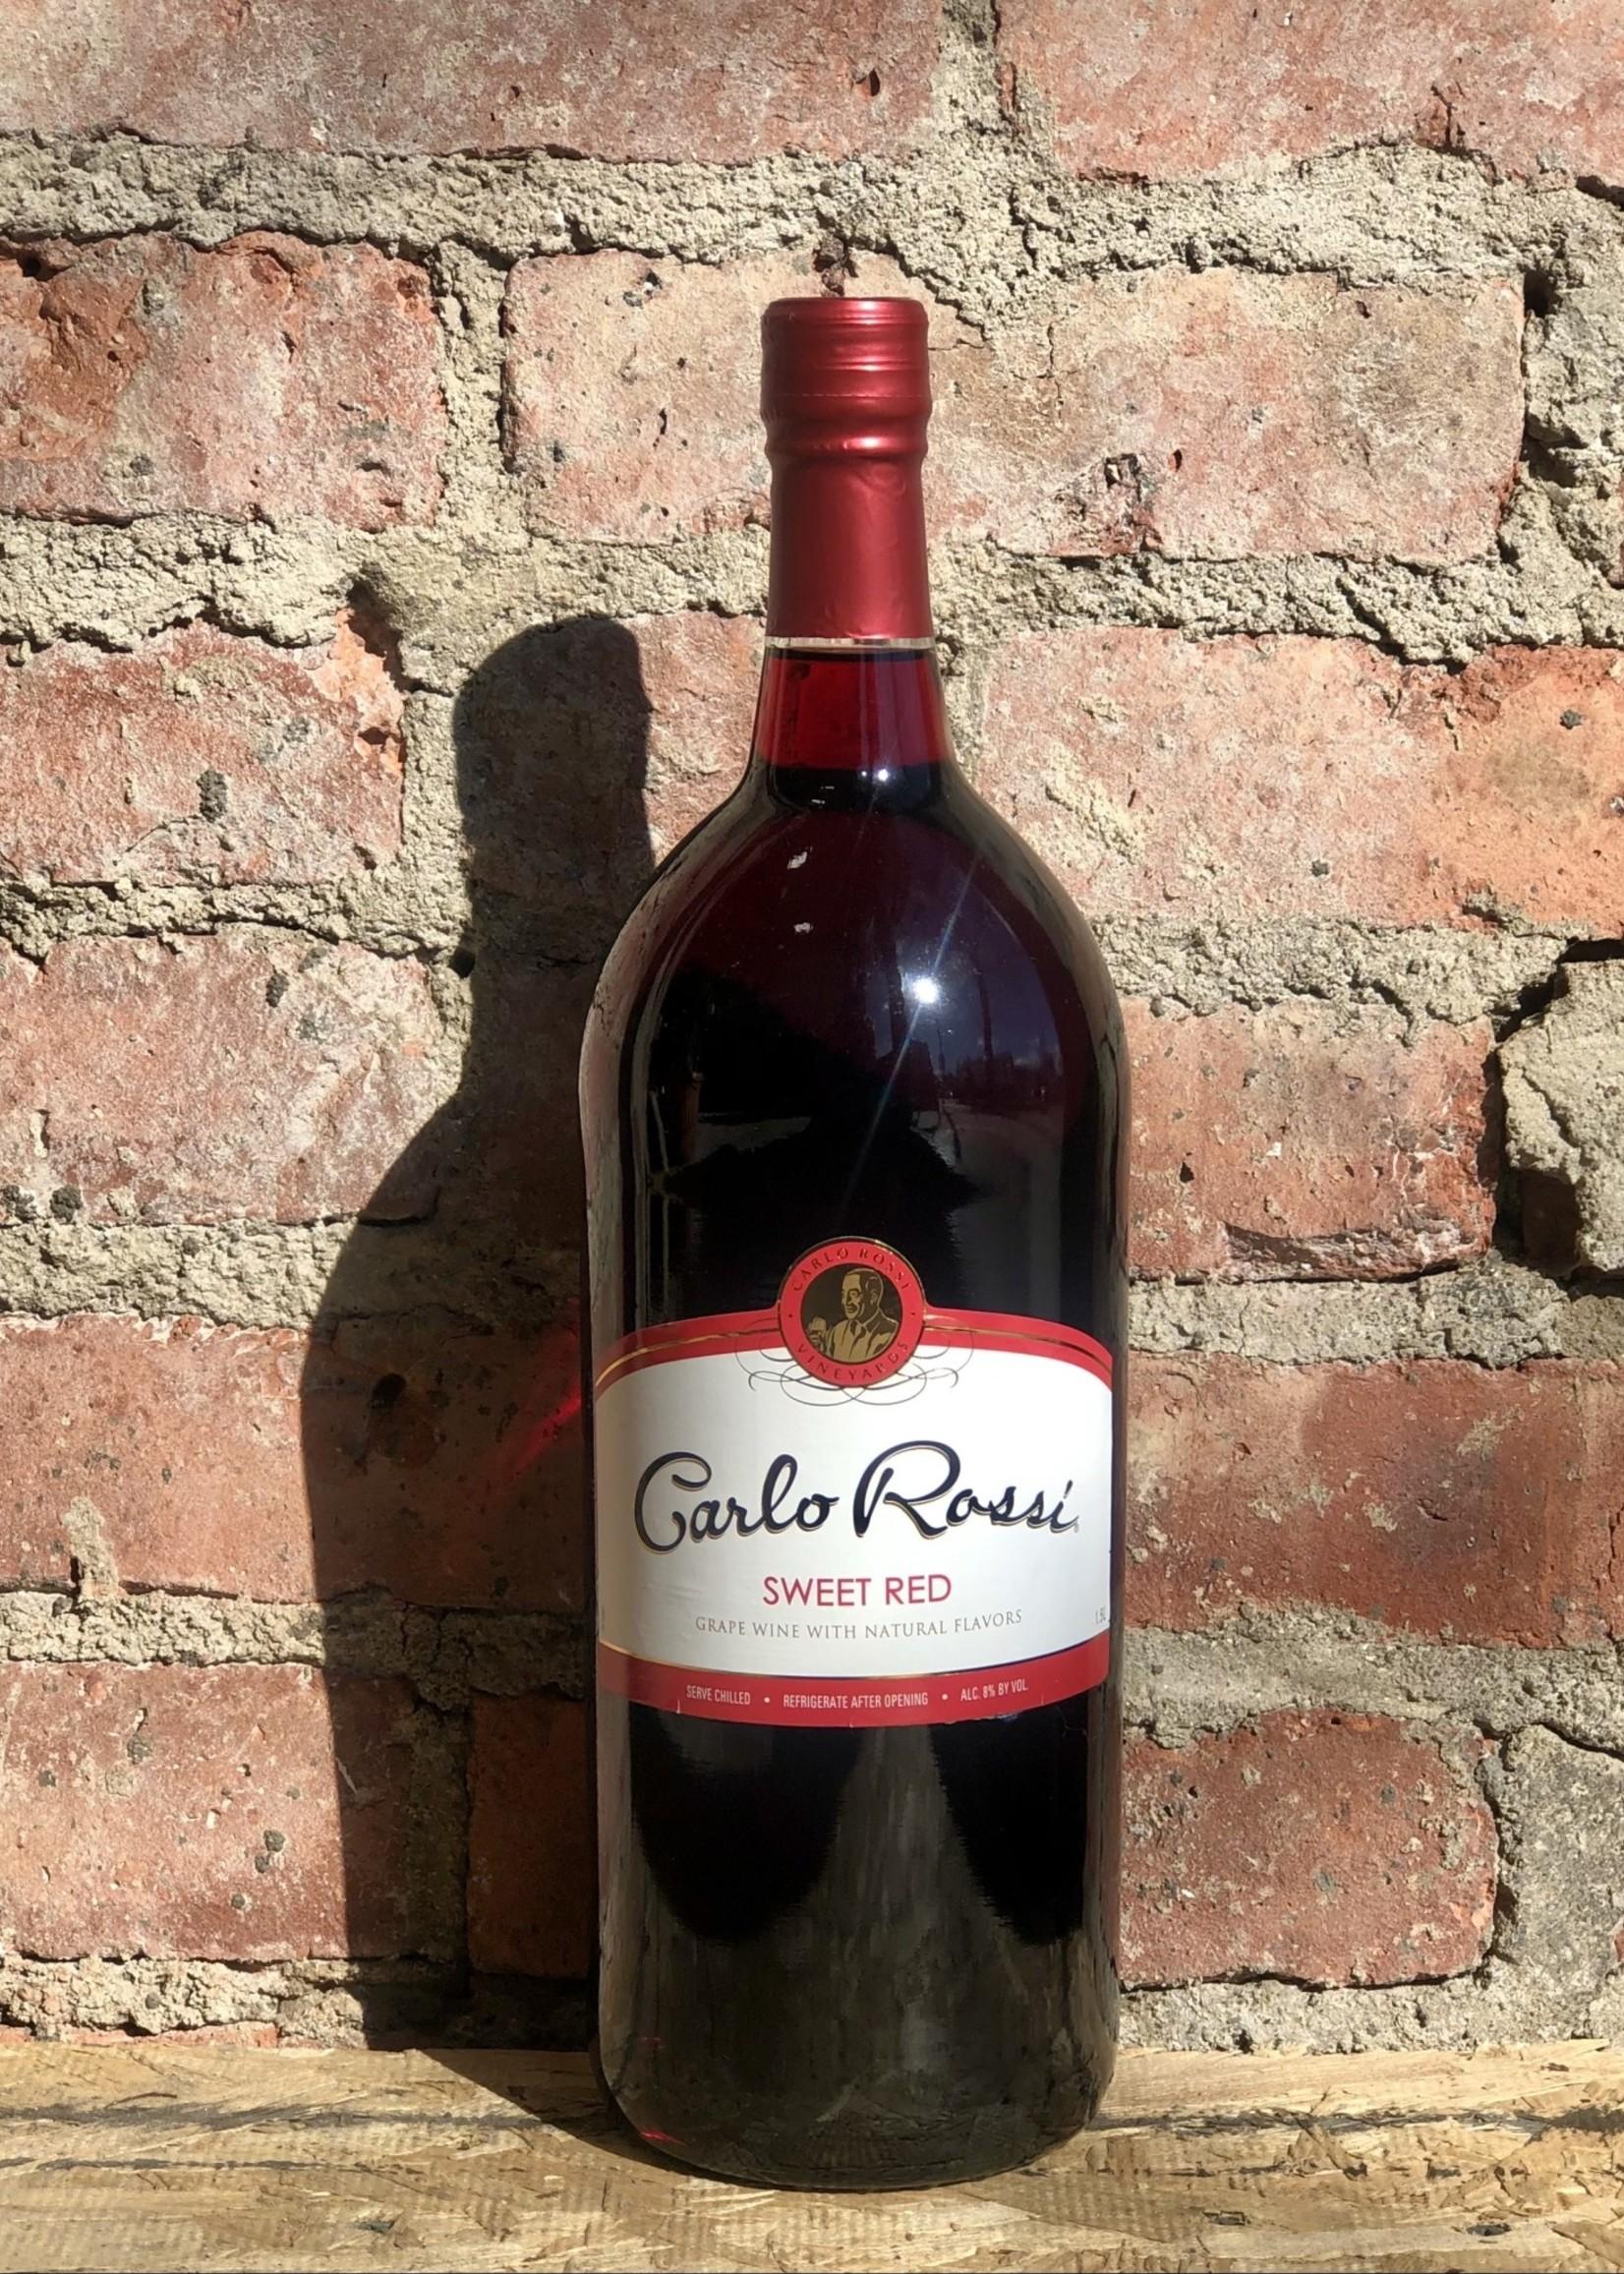 Carlo Rossi Sweet Red 1.5 L